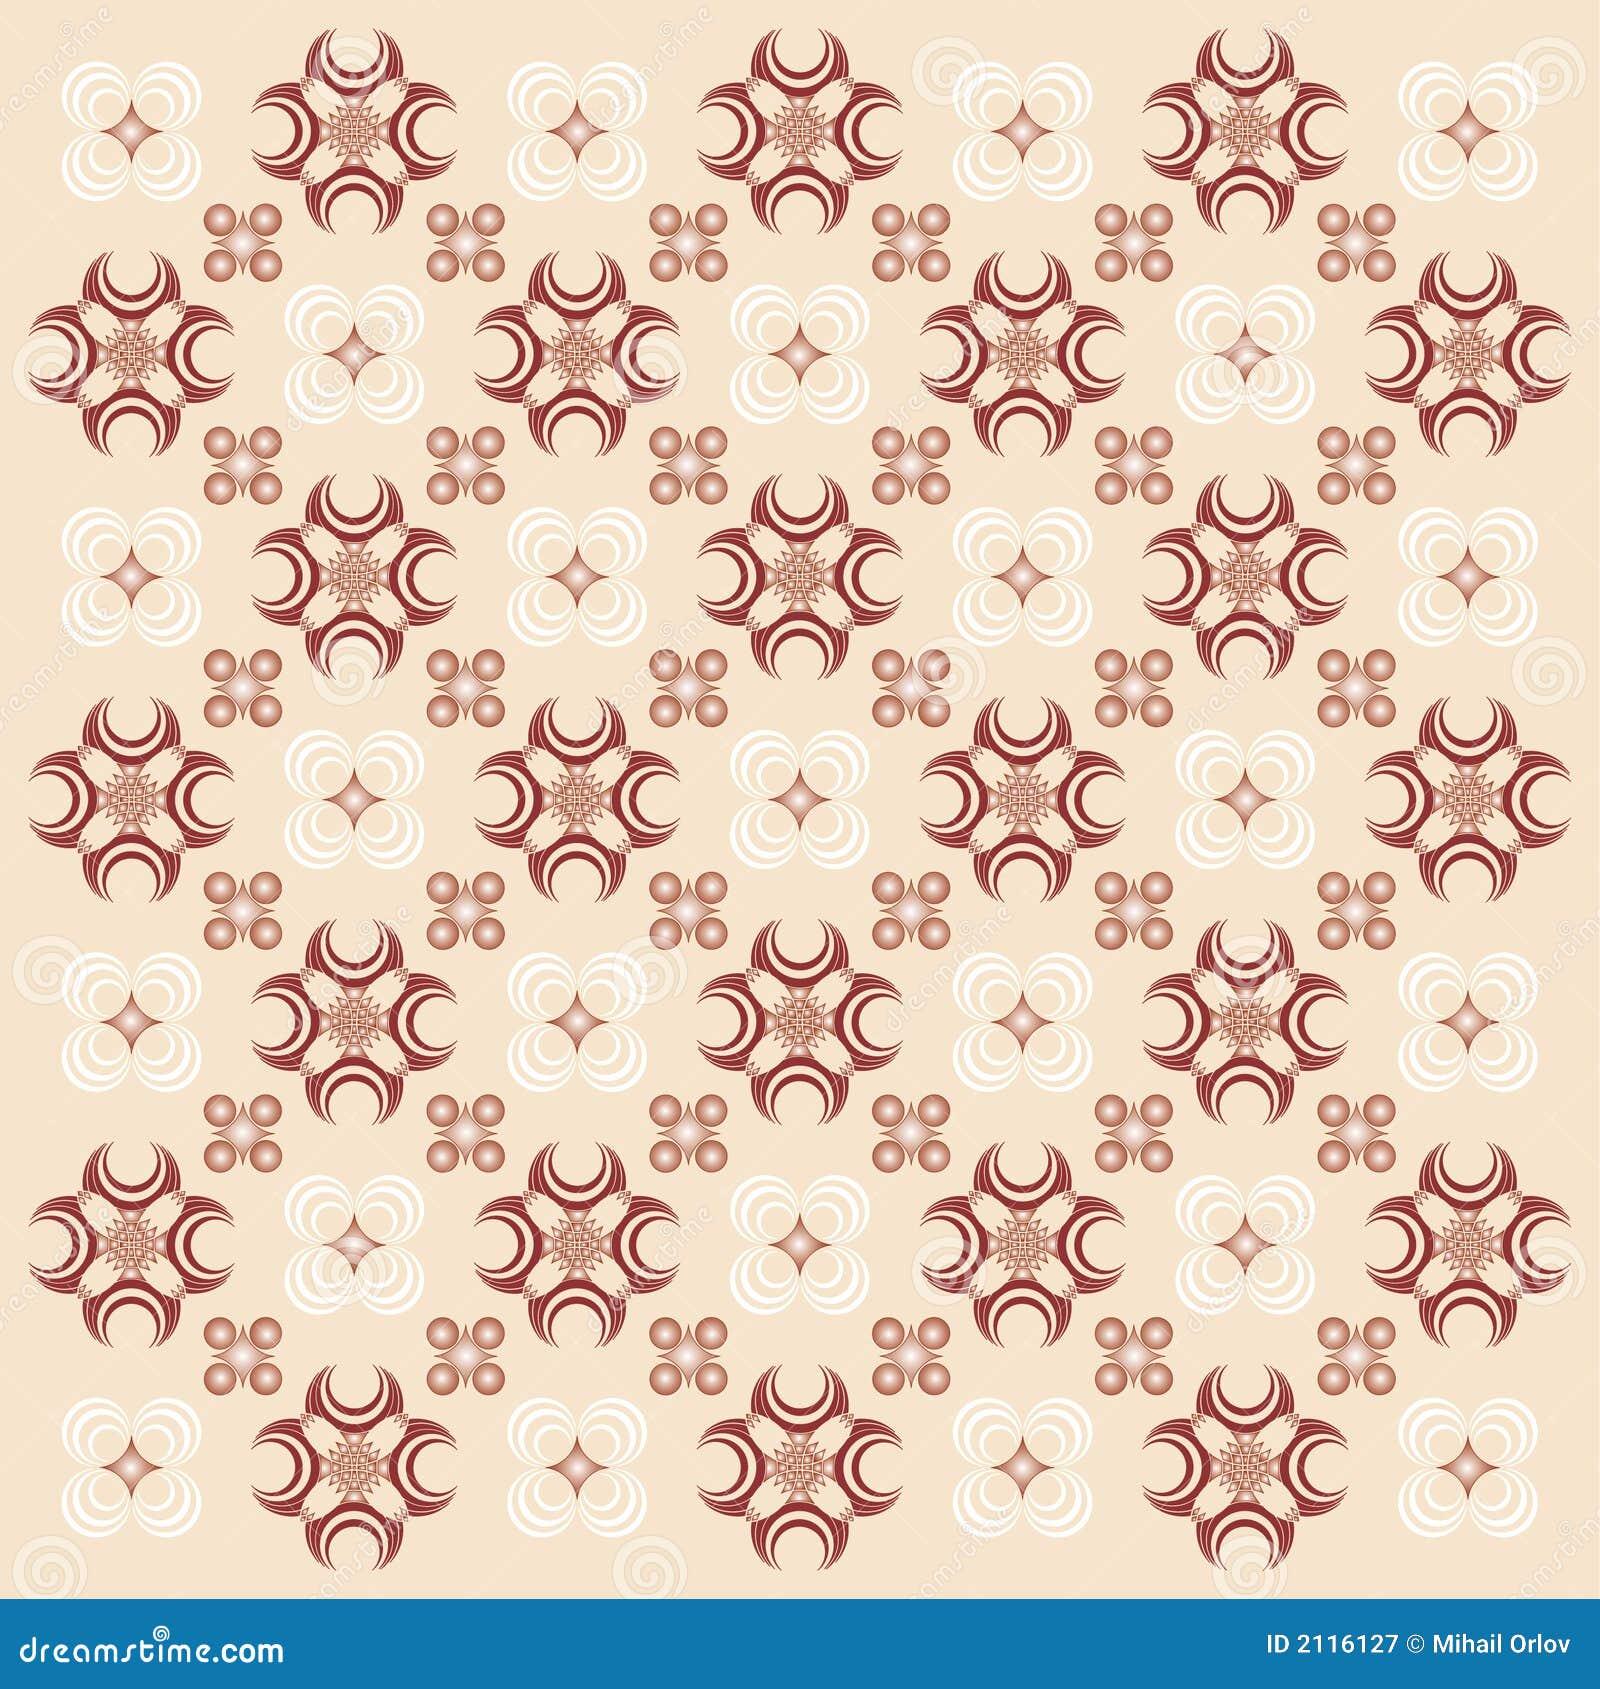 decorative wallpaper images  reverse search - filename decorativewallpaper